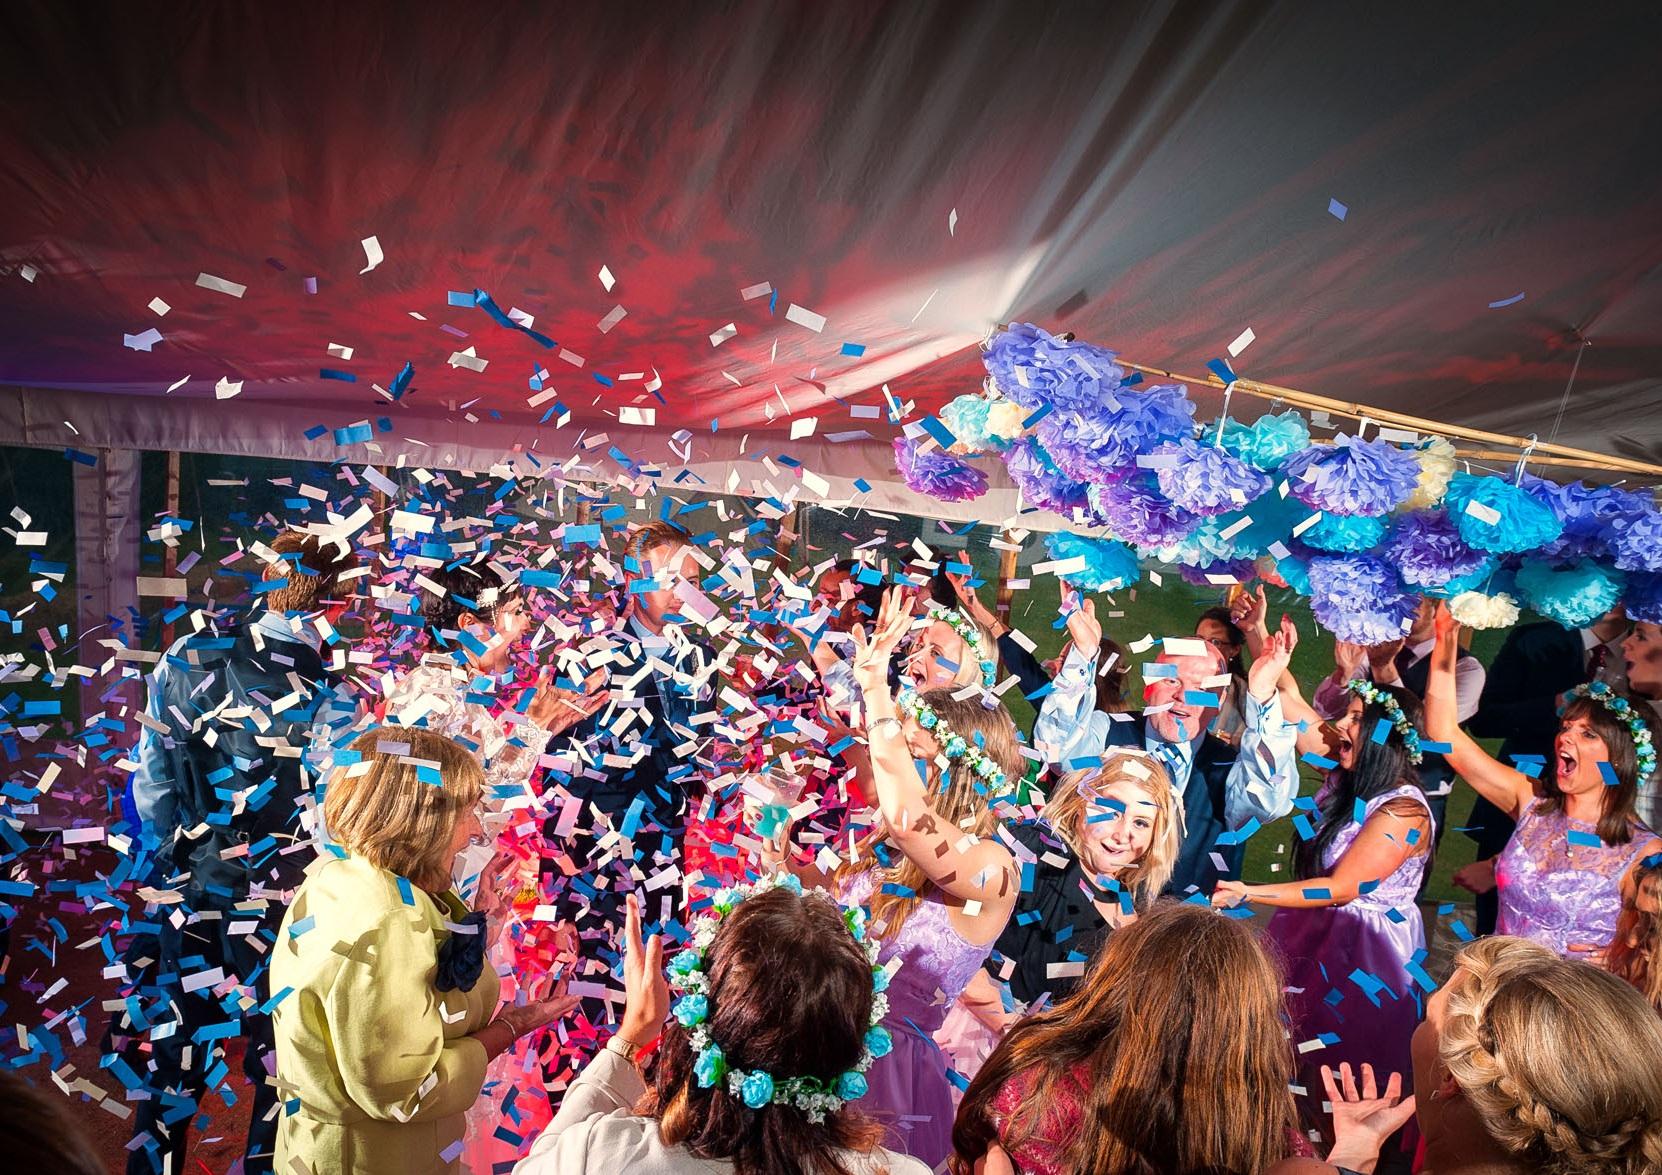 confetti-canon-at-wedding.jpg